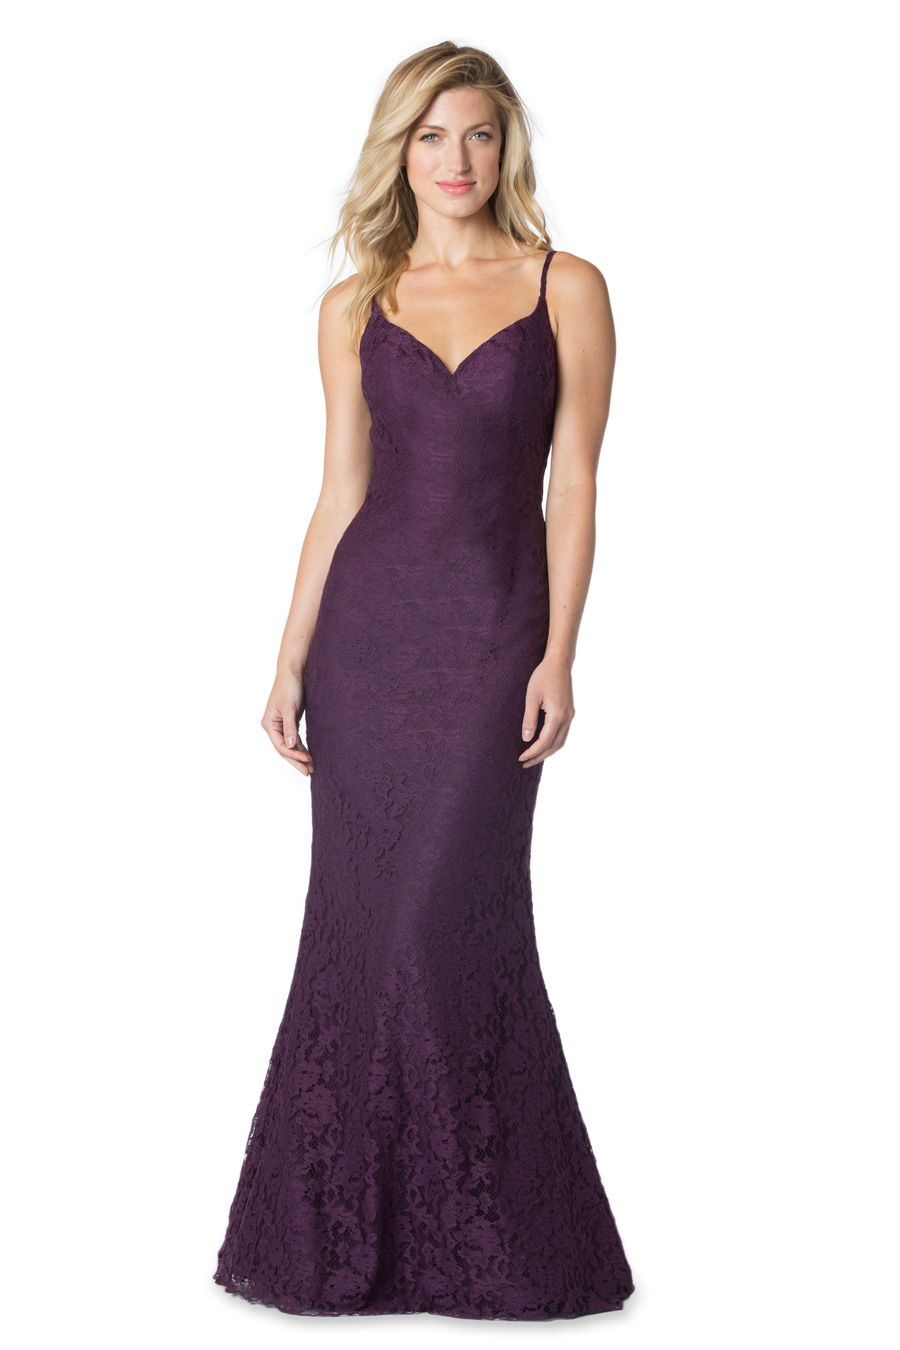 Bari Jay Fashions ( STYLE 1609 ) Available at Enchantment Bridal in Chatham, On. 519-360-1100